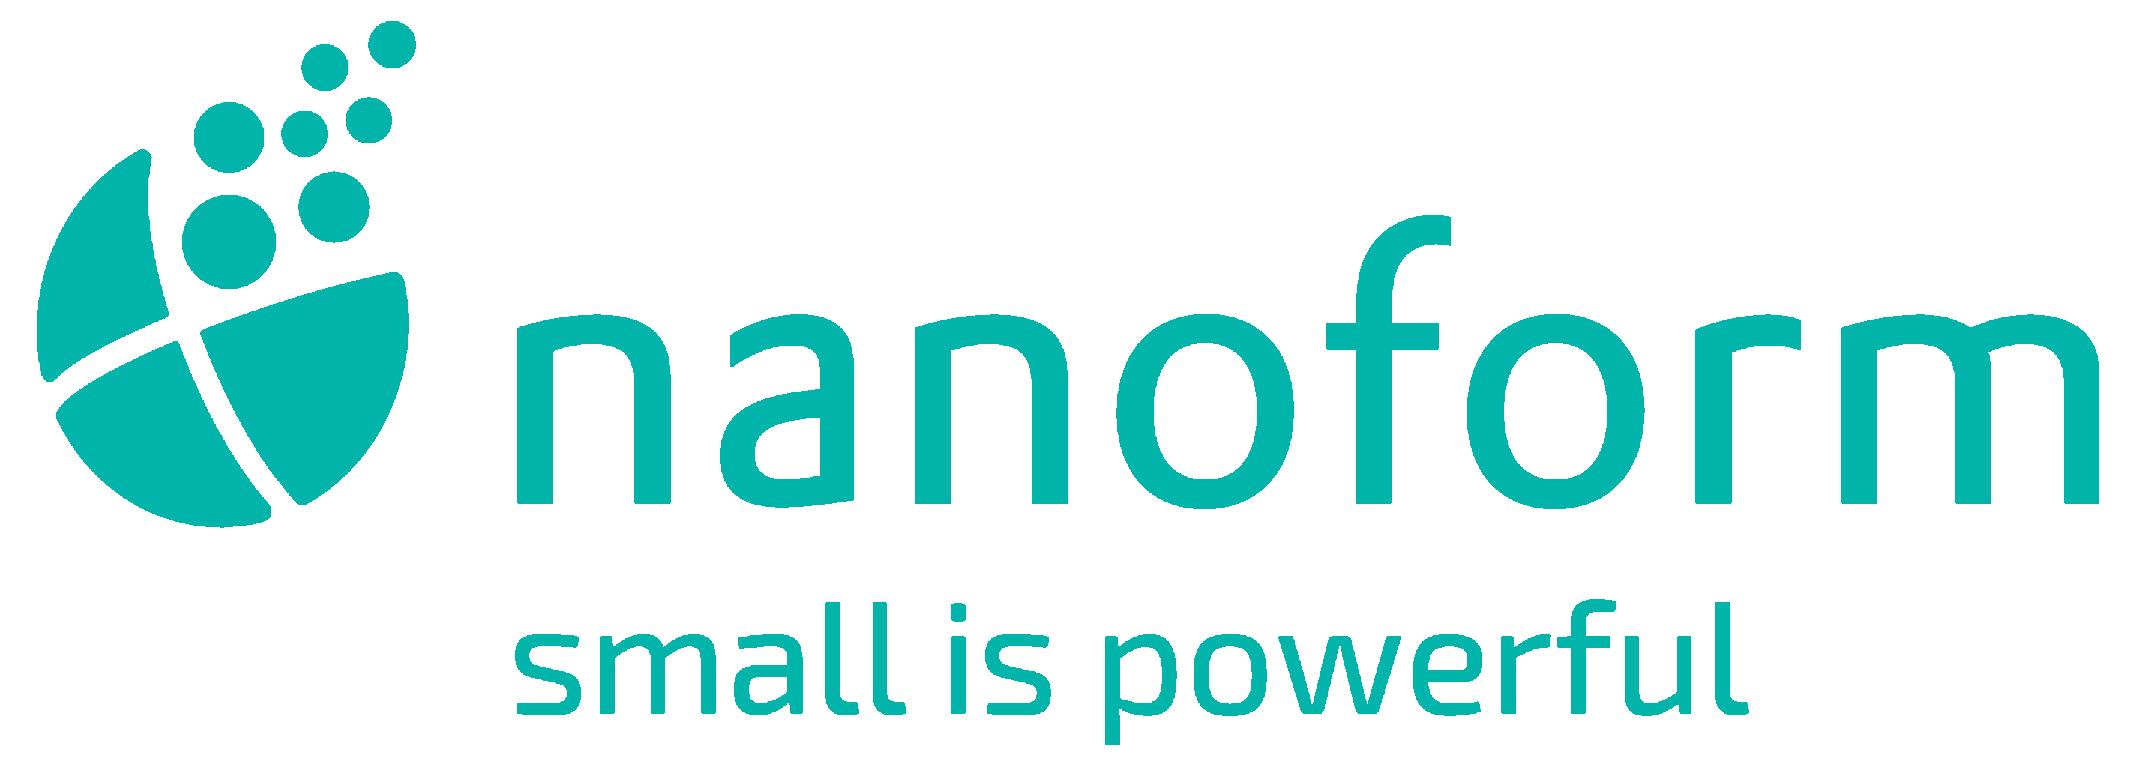 nanoform_logo.jpg